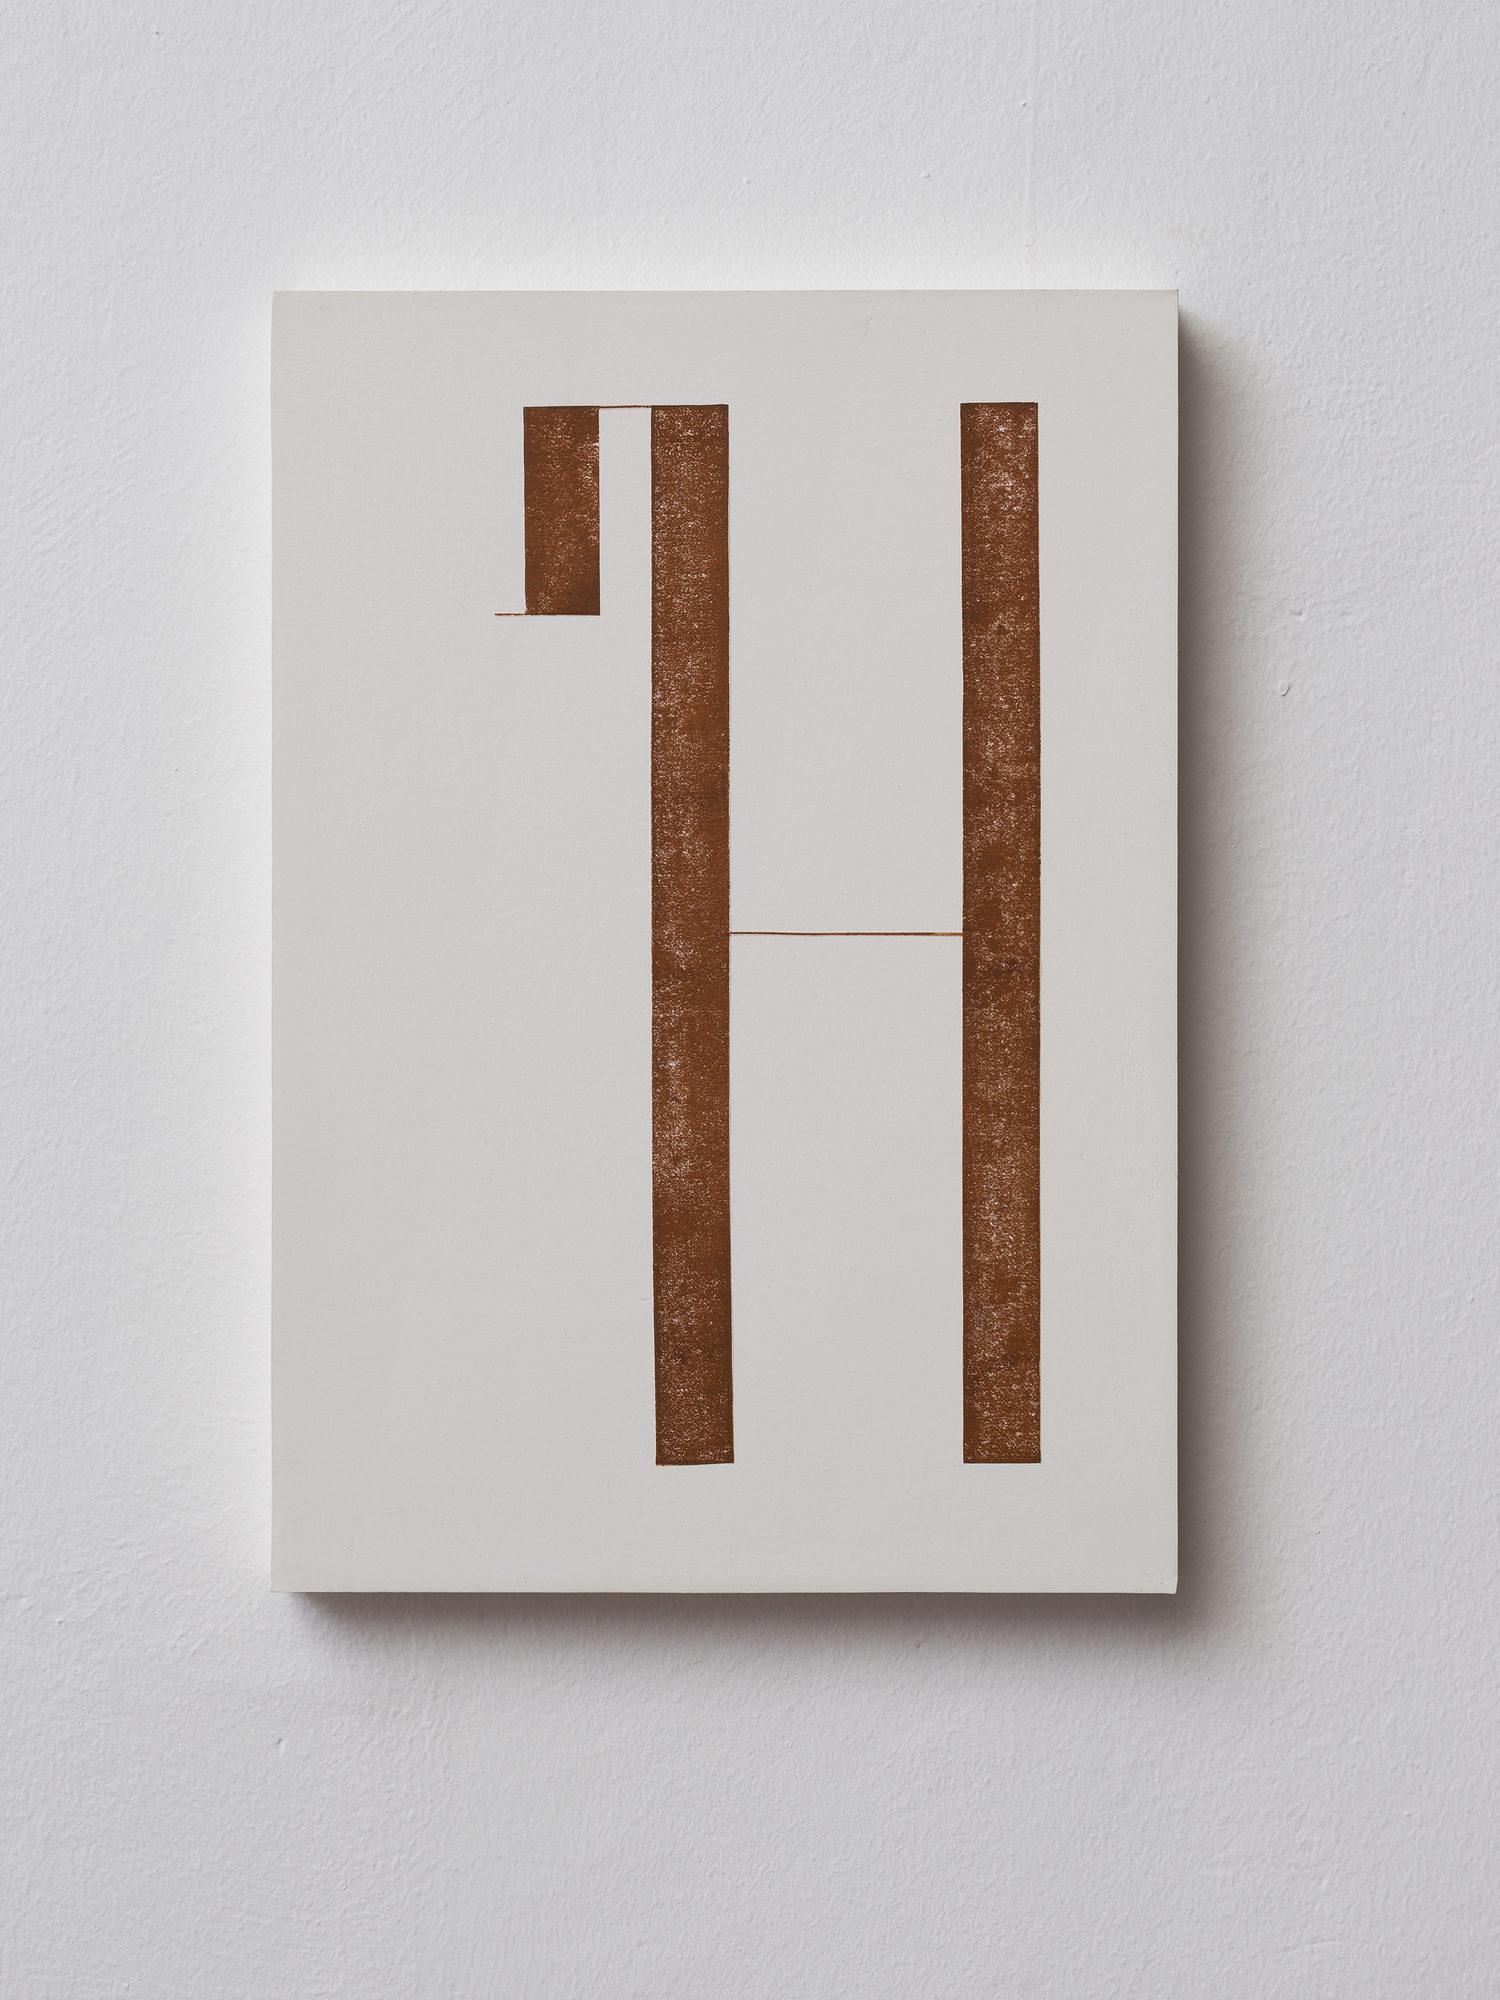 Florian Pumhösl, ዝናብ (Rain) - First Letter, 2015, Collaged monotype print on plasterboard, 39.5 x 27.5 cm